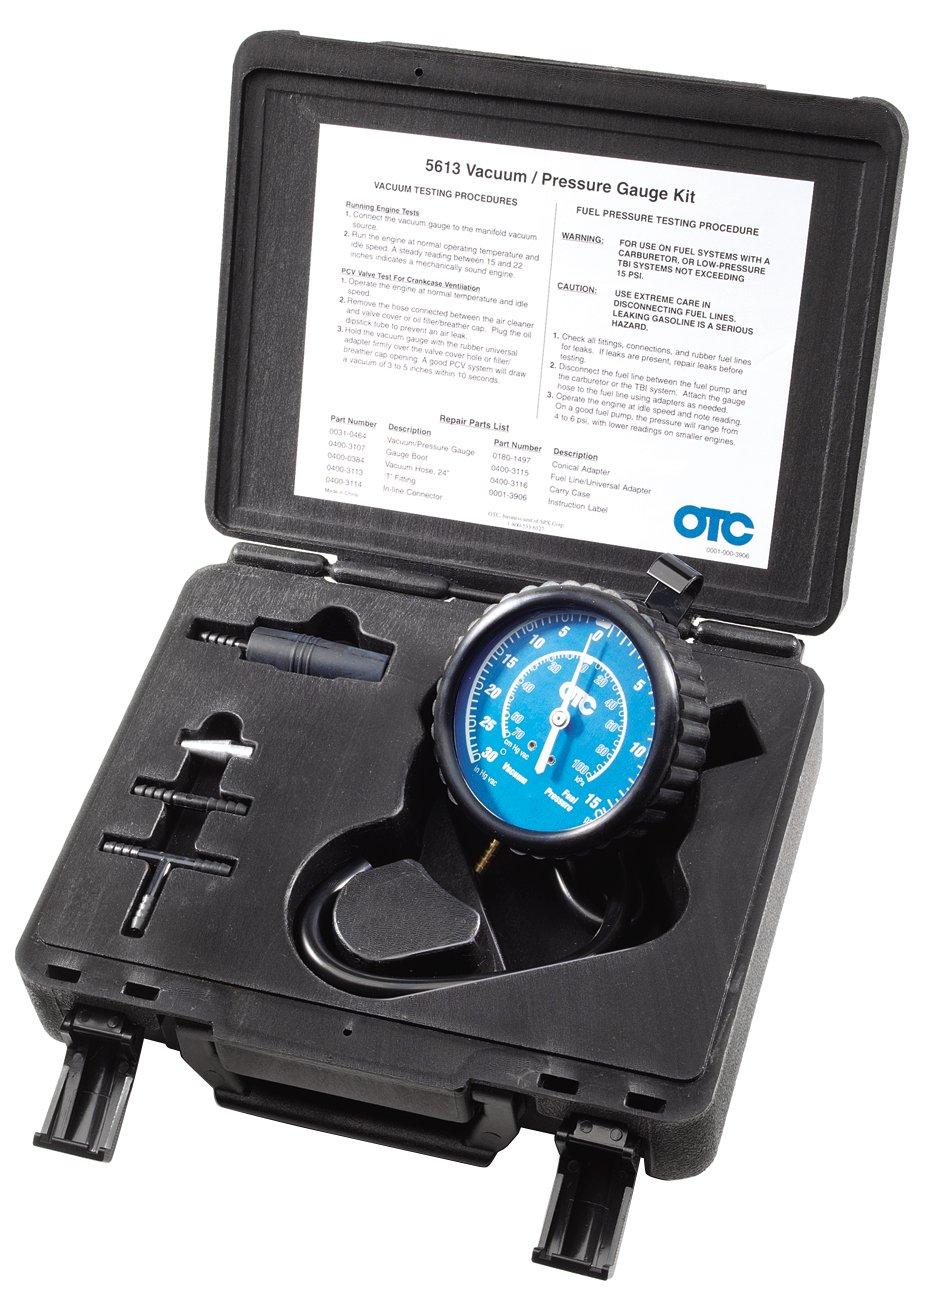 OTC 5613 Vacuum/Pressure Gauge Kit by OTC